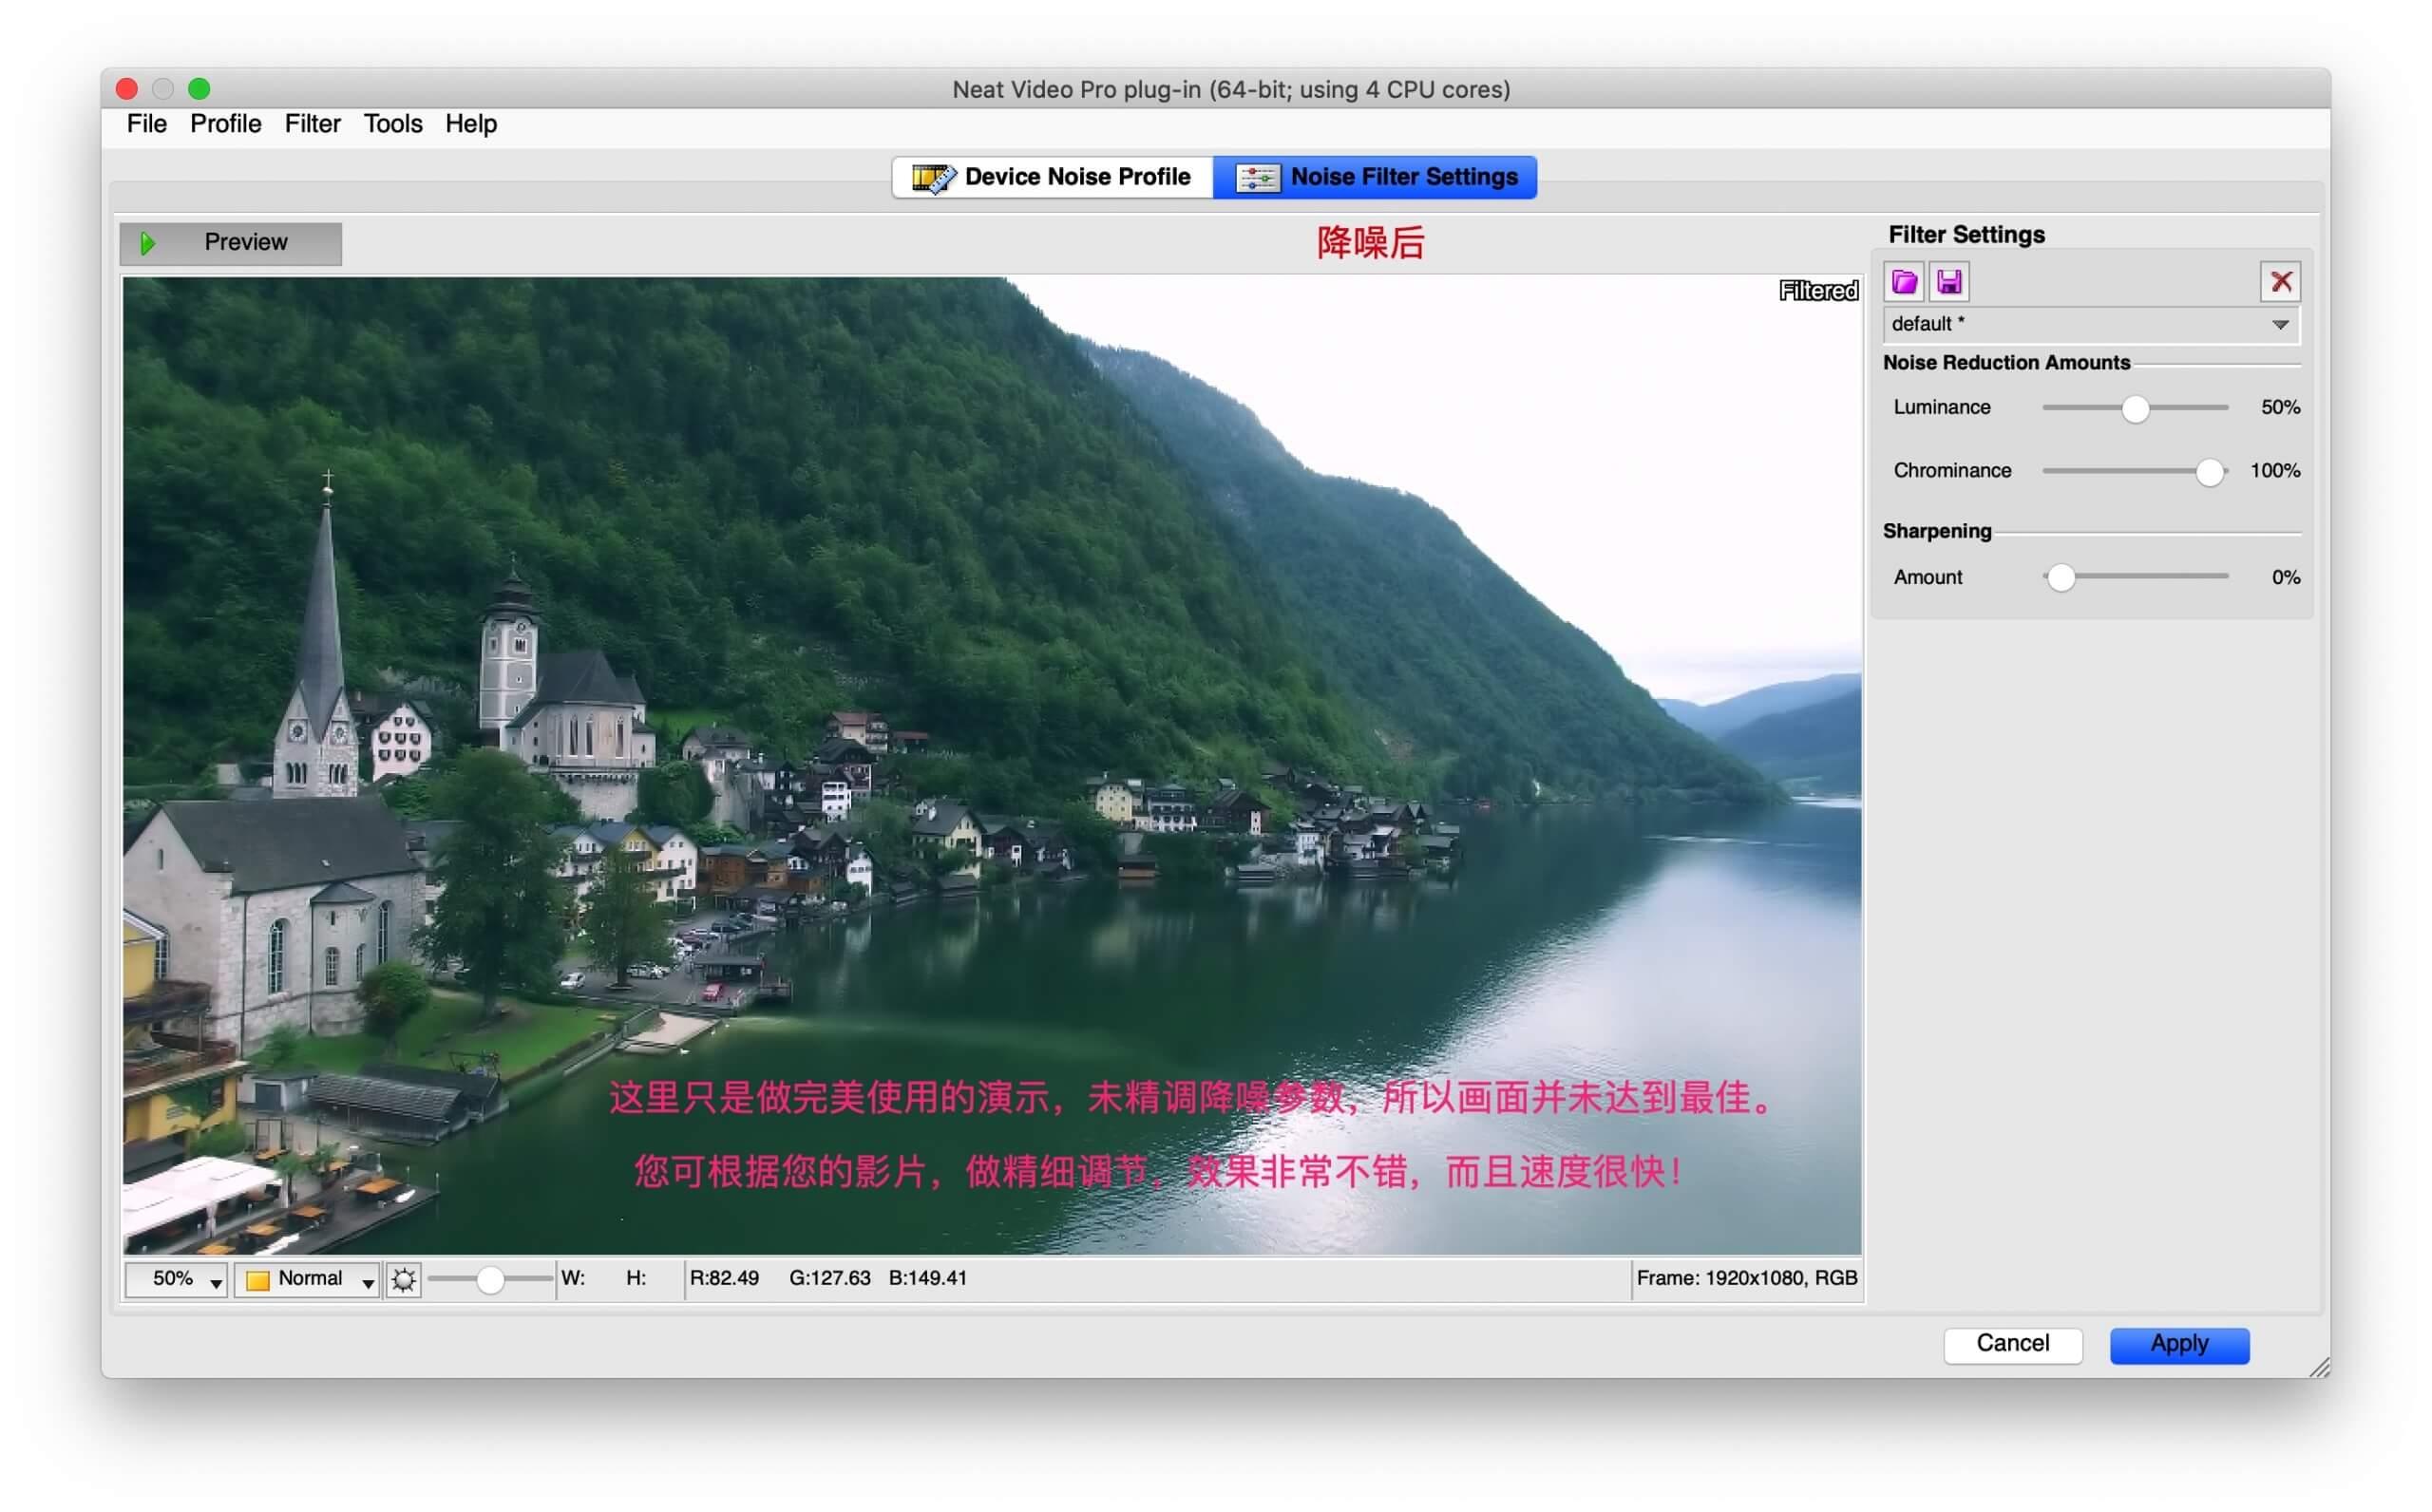 fcpx插件 专业视频画面降噪插件 Neat Video 支持10.15系统